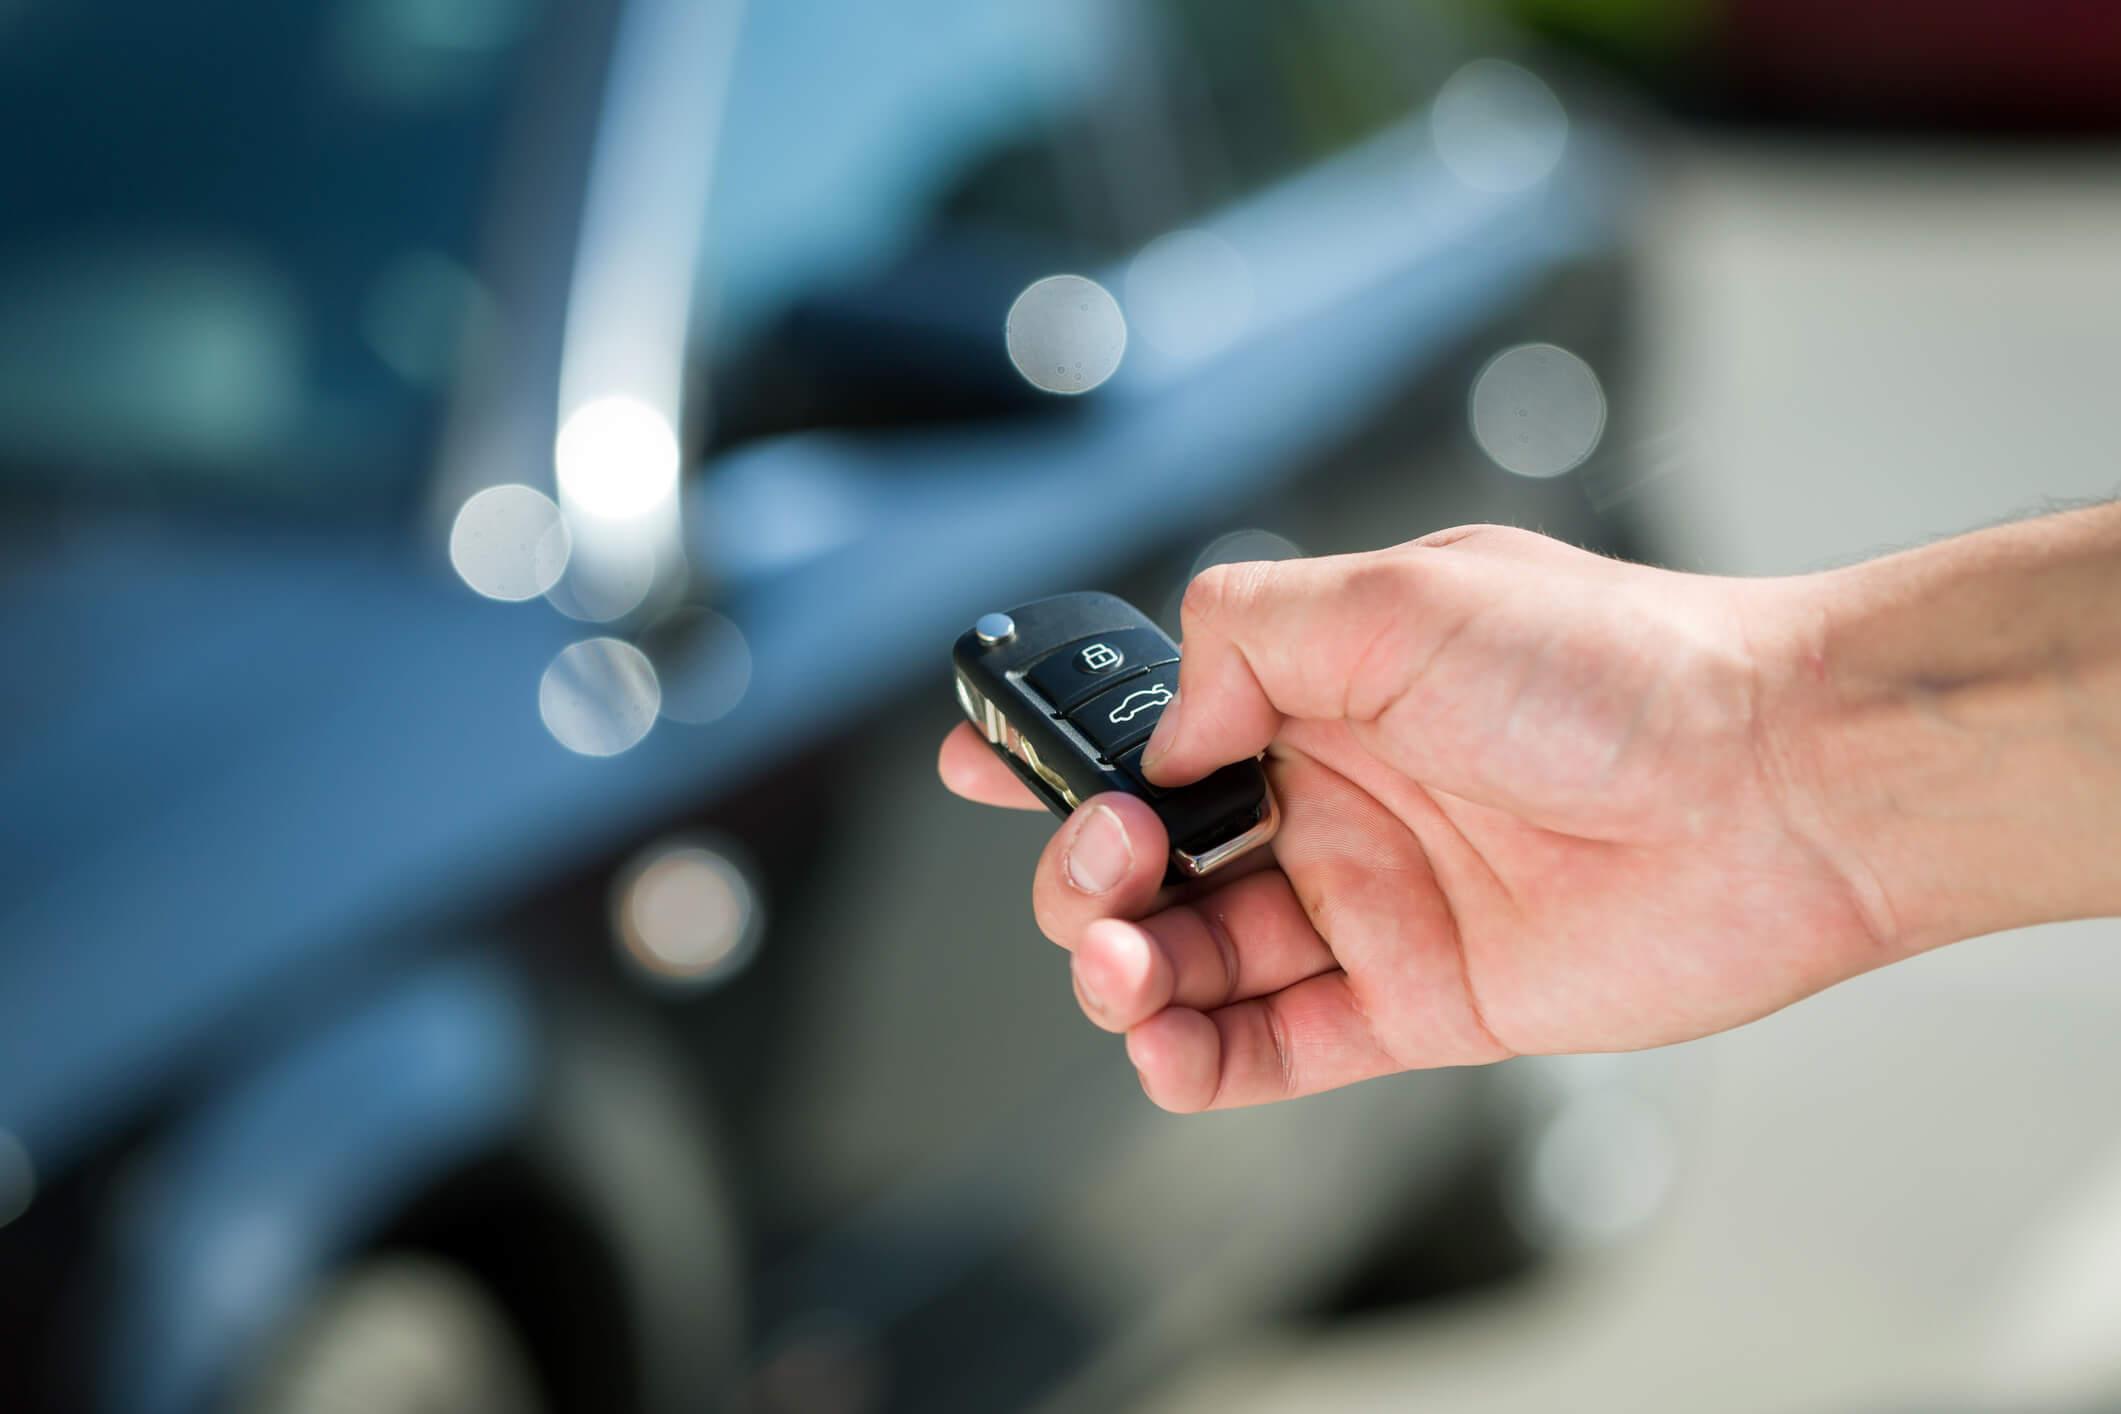 keyless car theft.jpg (94 KB)